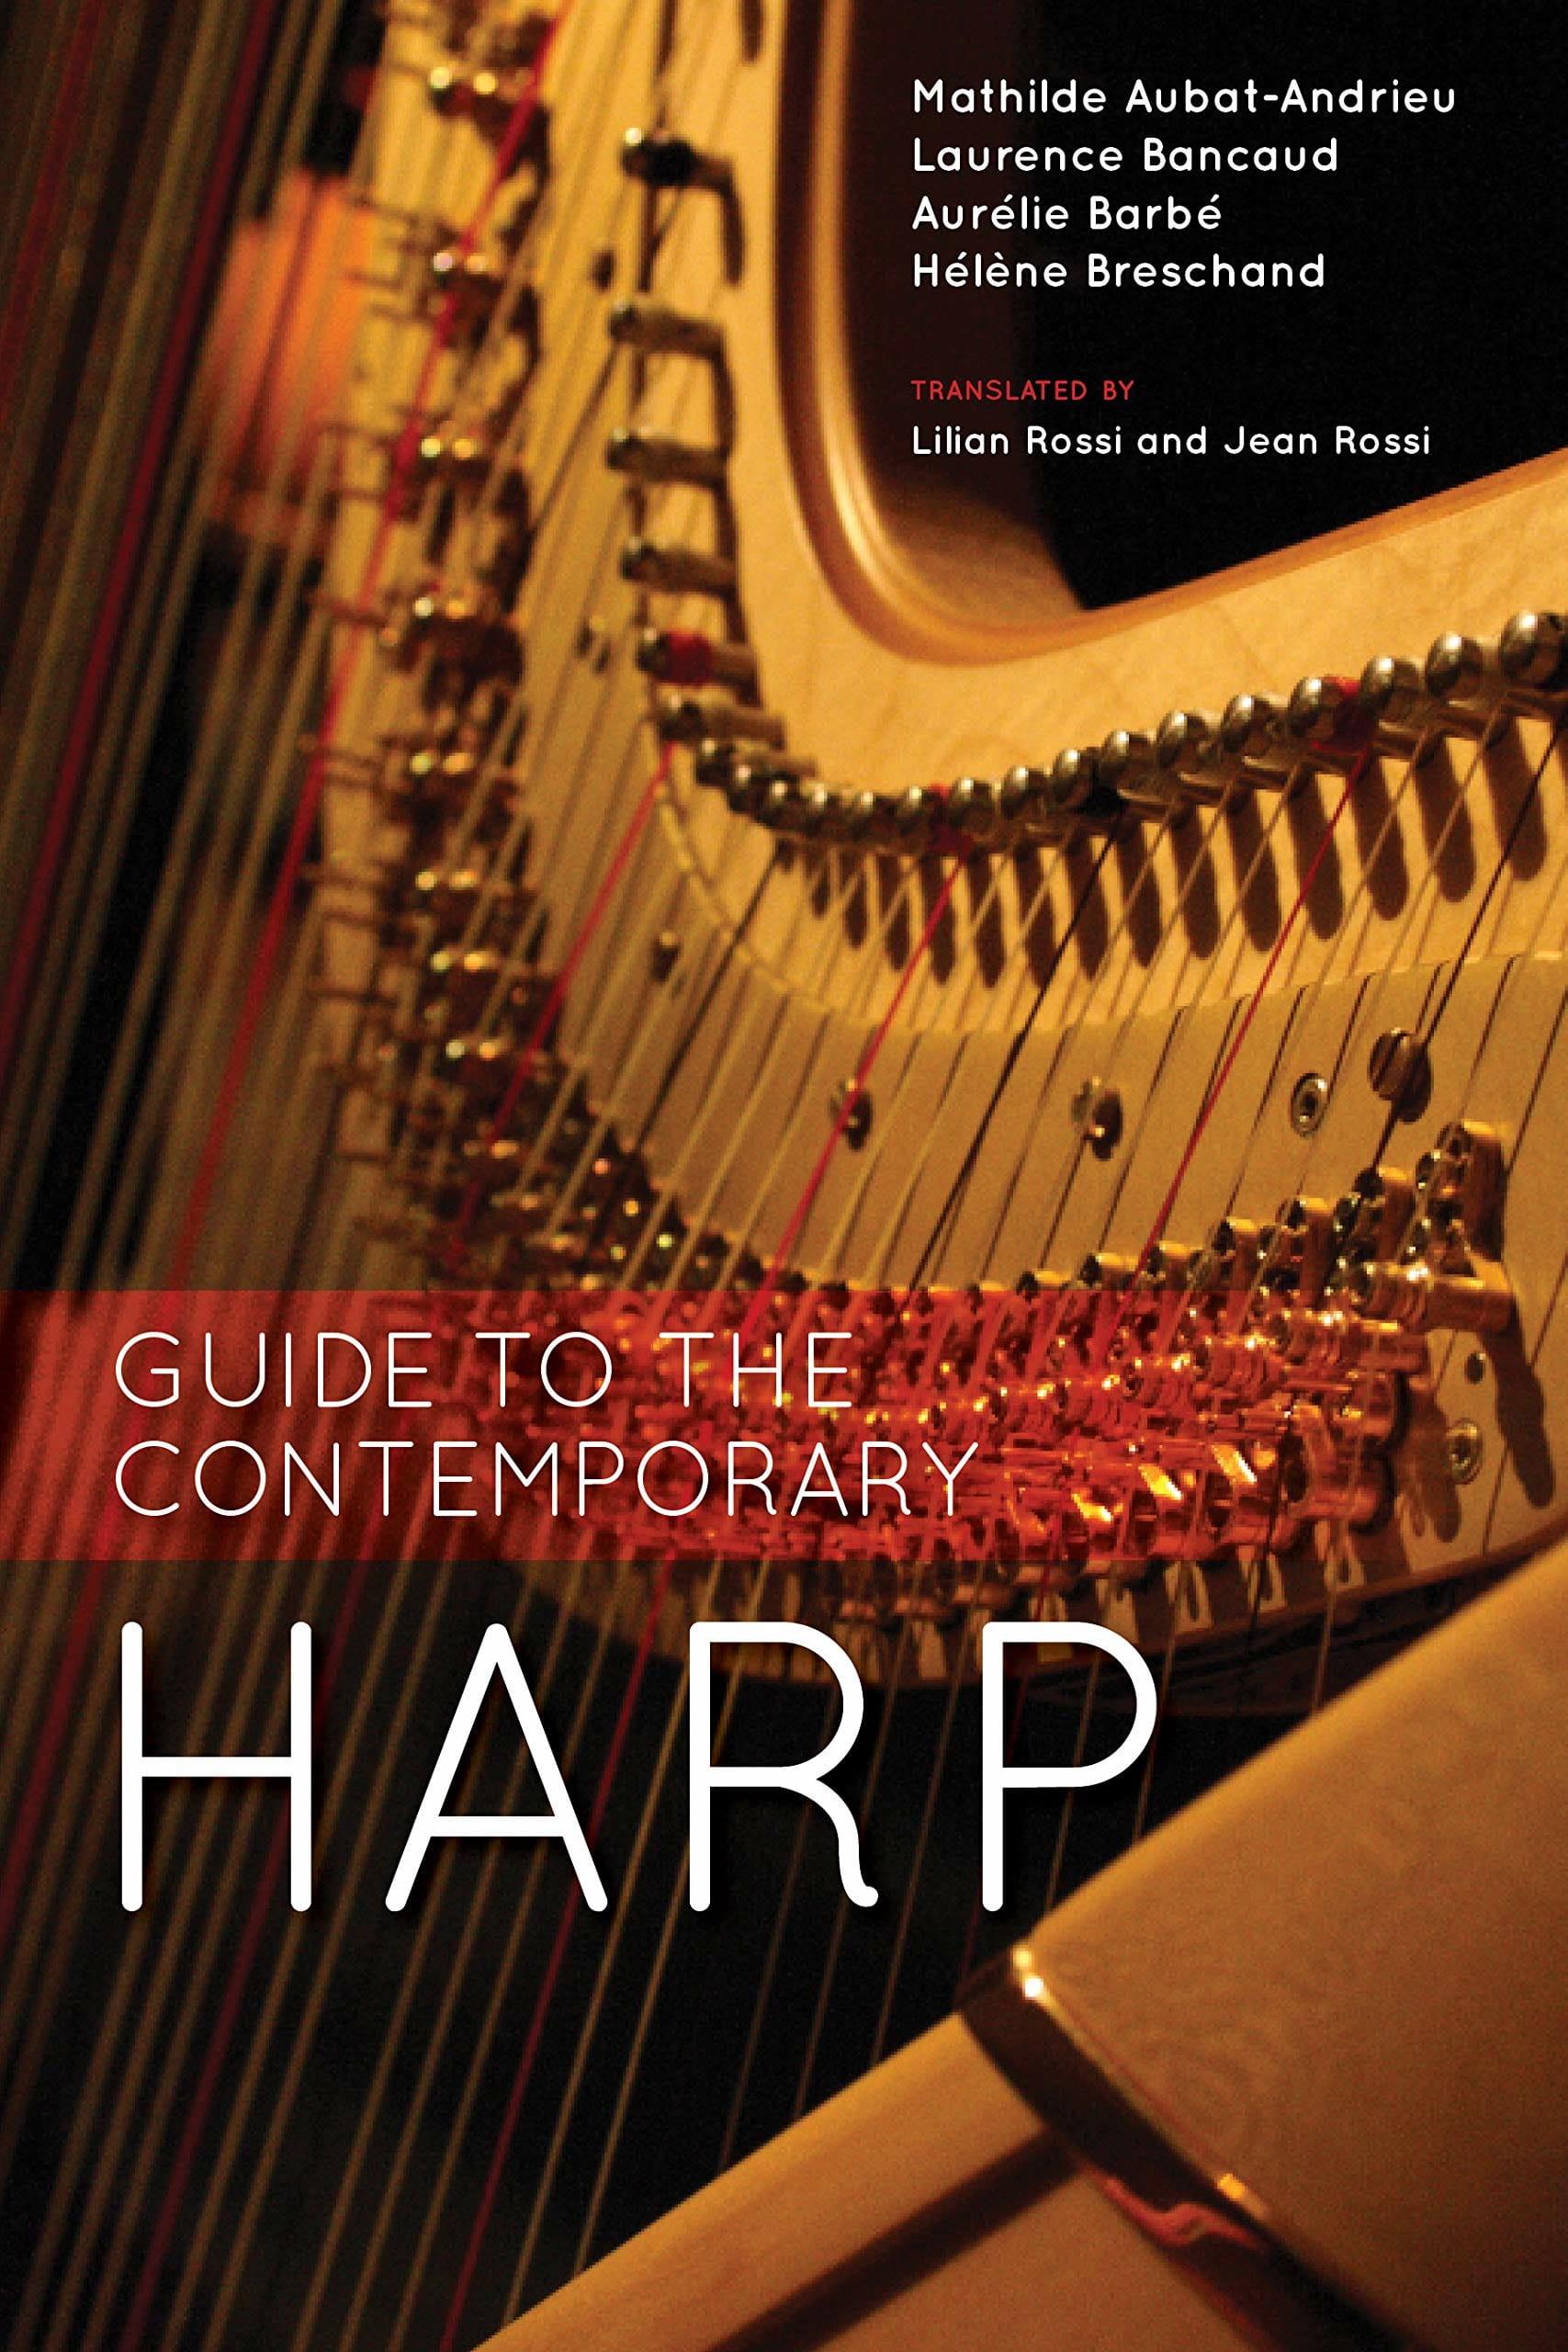 Guide to the contemporary harp - Collectif - Livre - laflutedepan.com